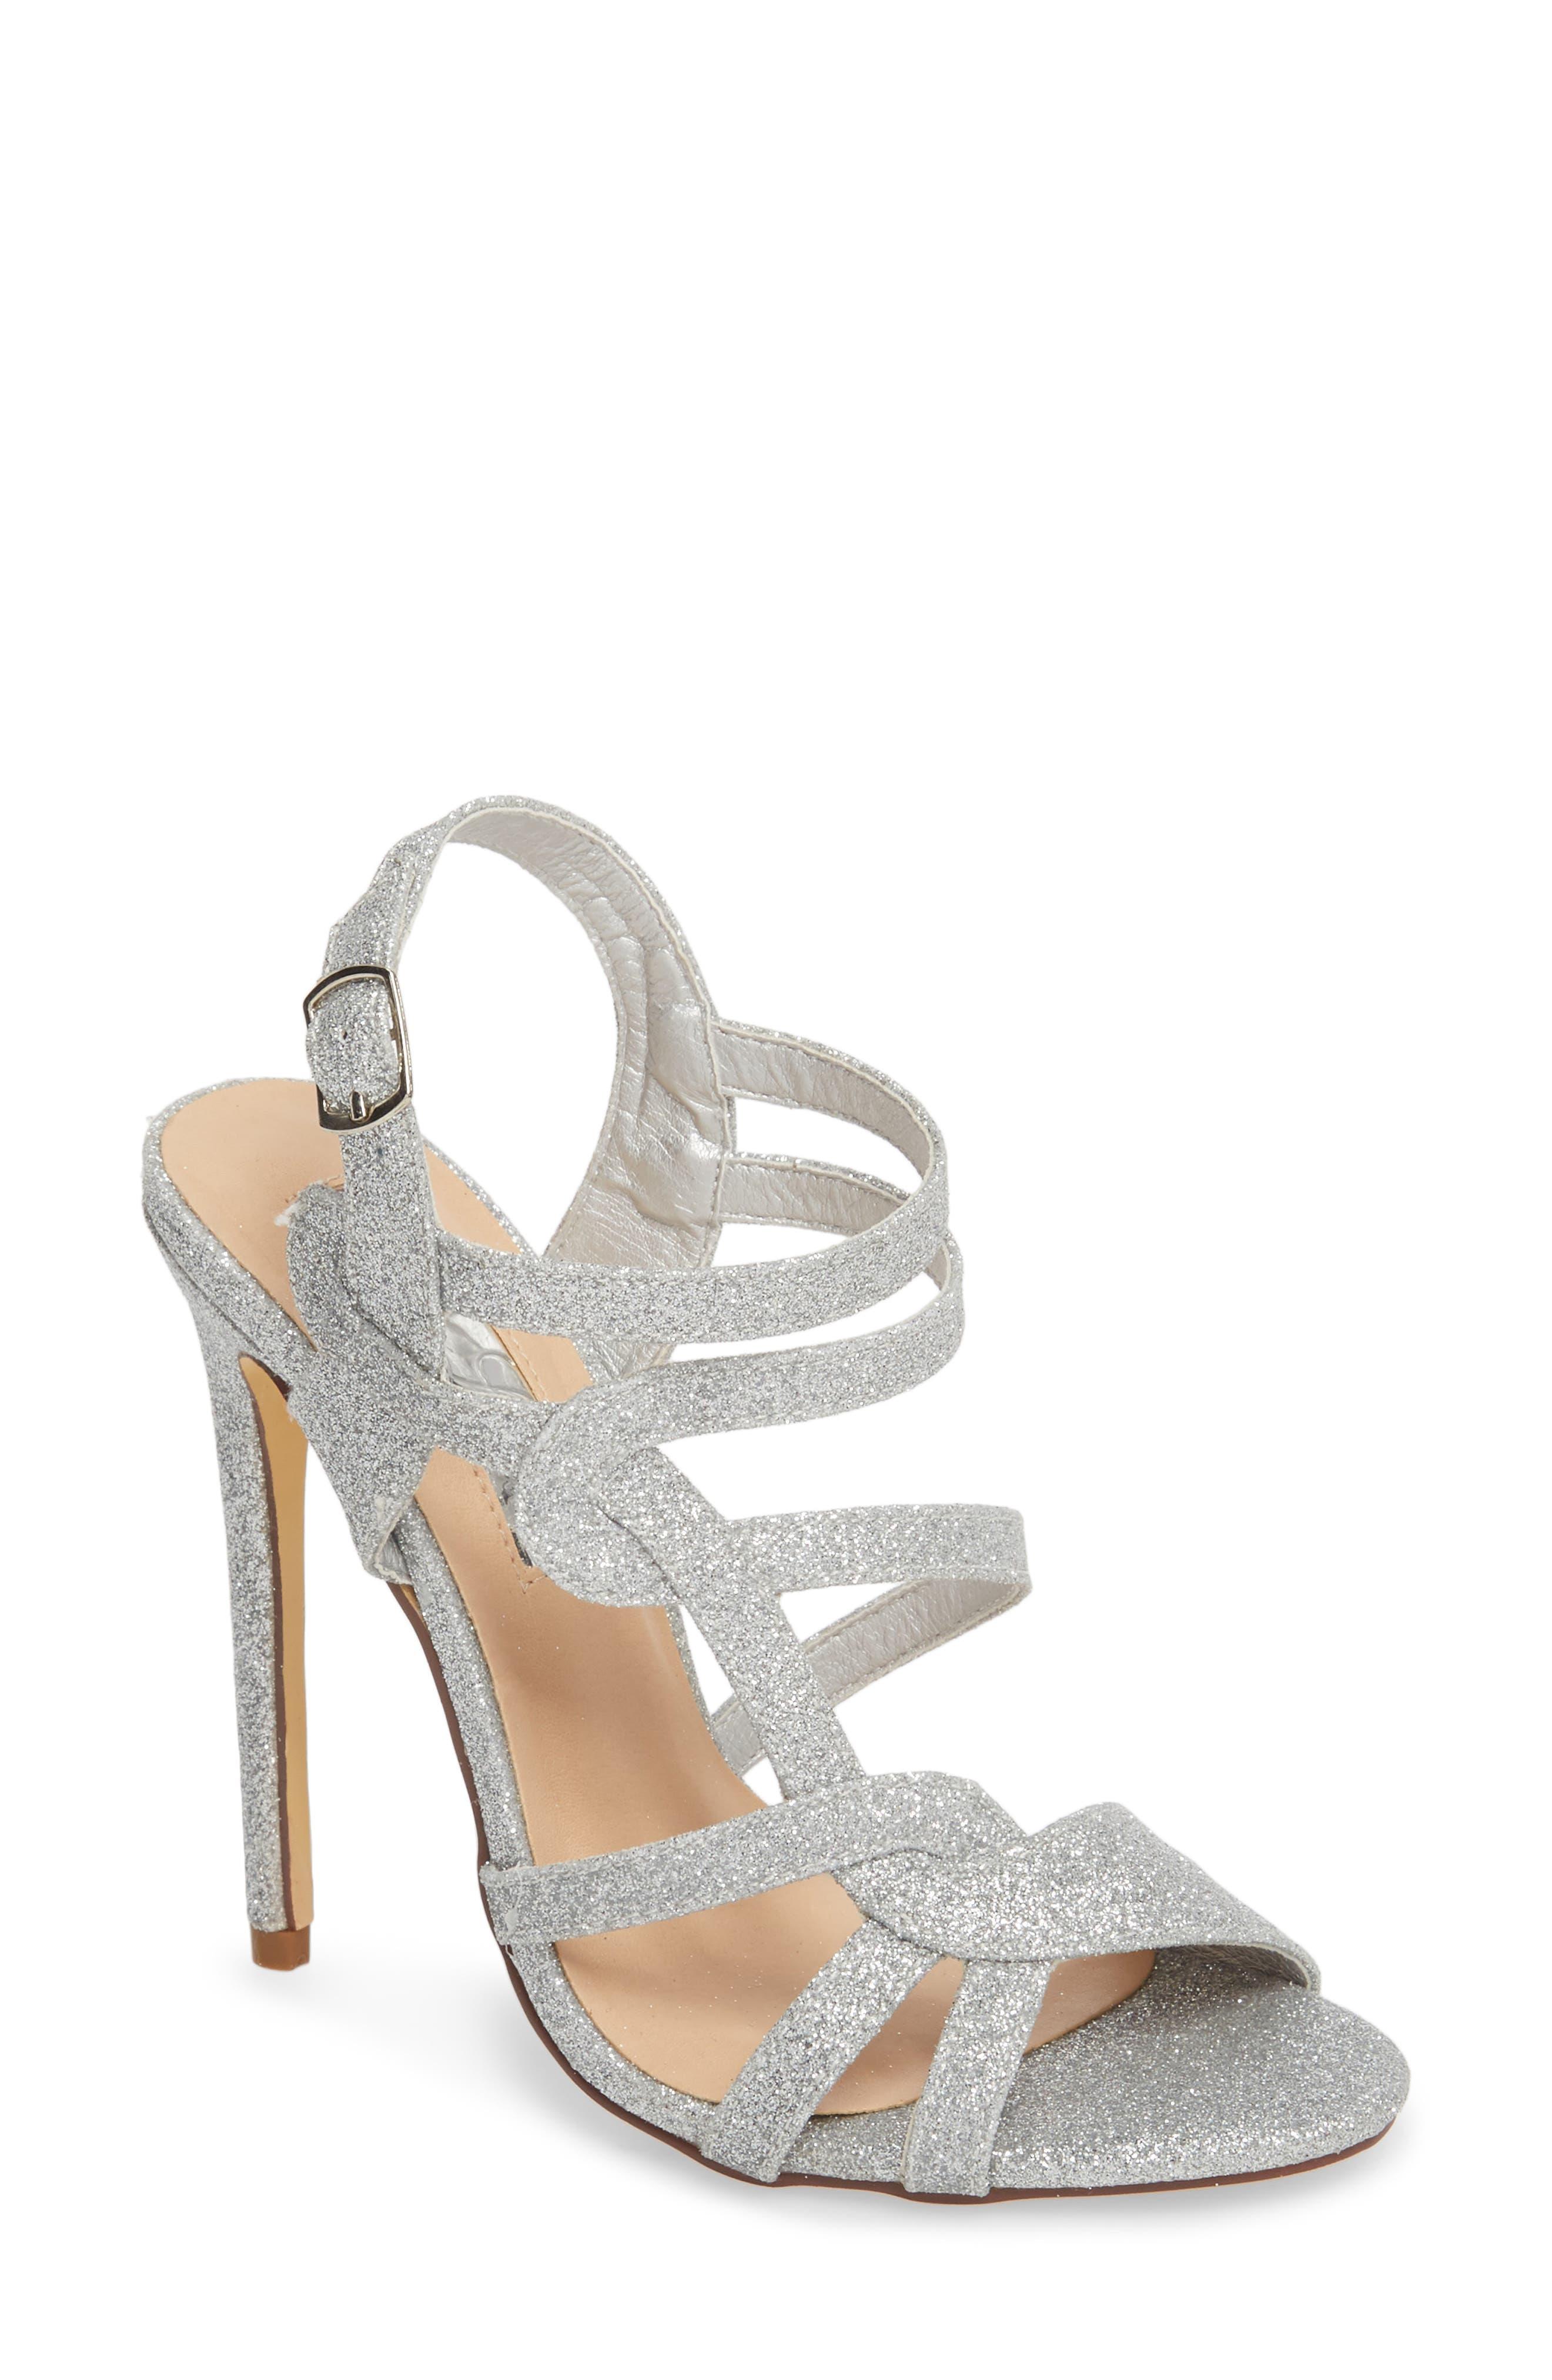 Lauren Lorraine Gidget Sandal- Metallic